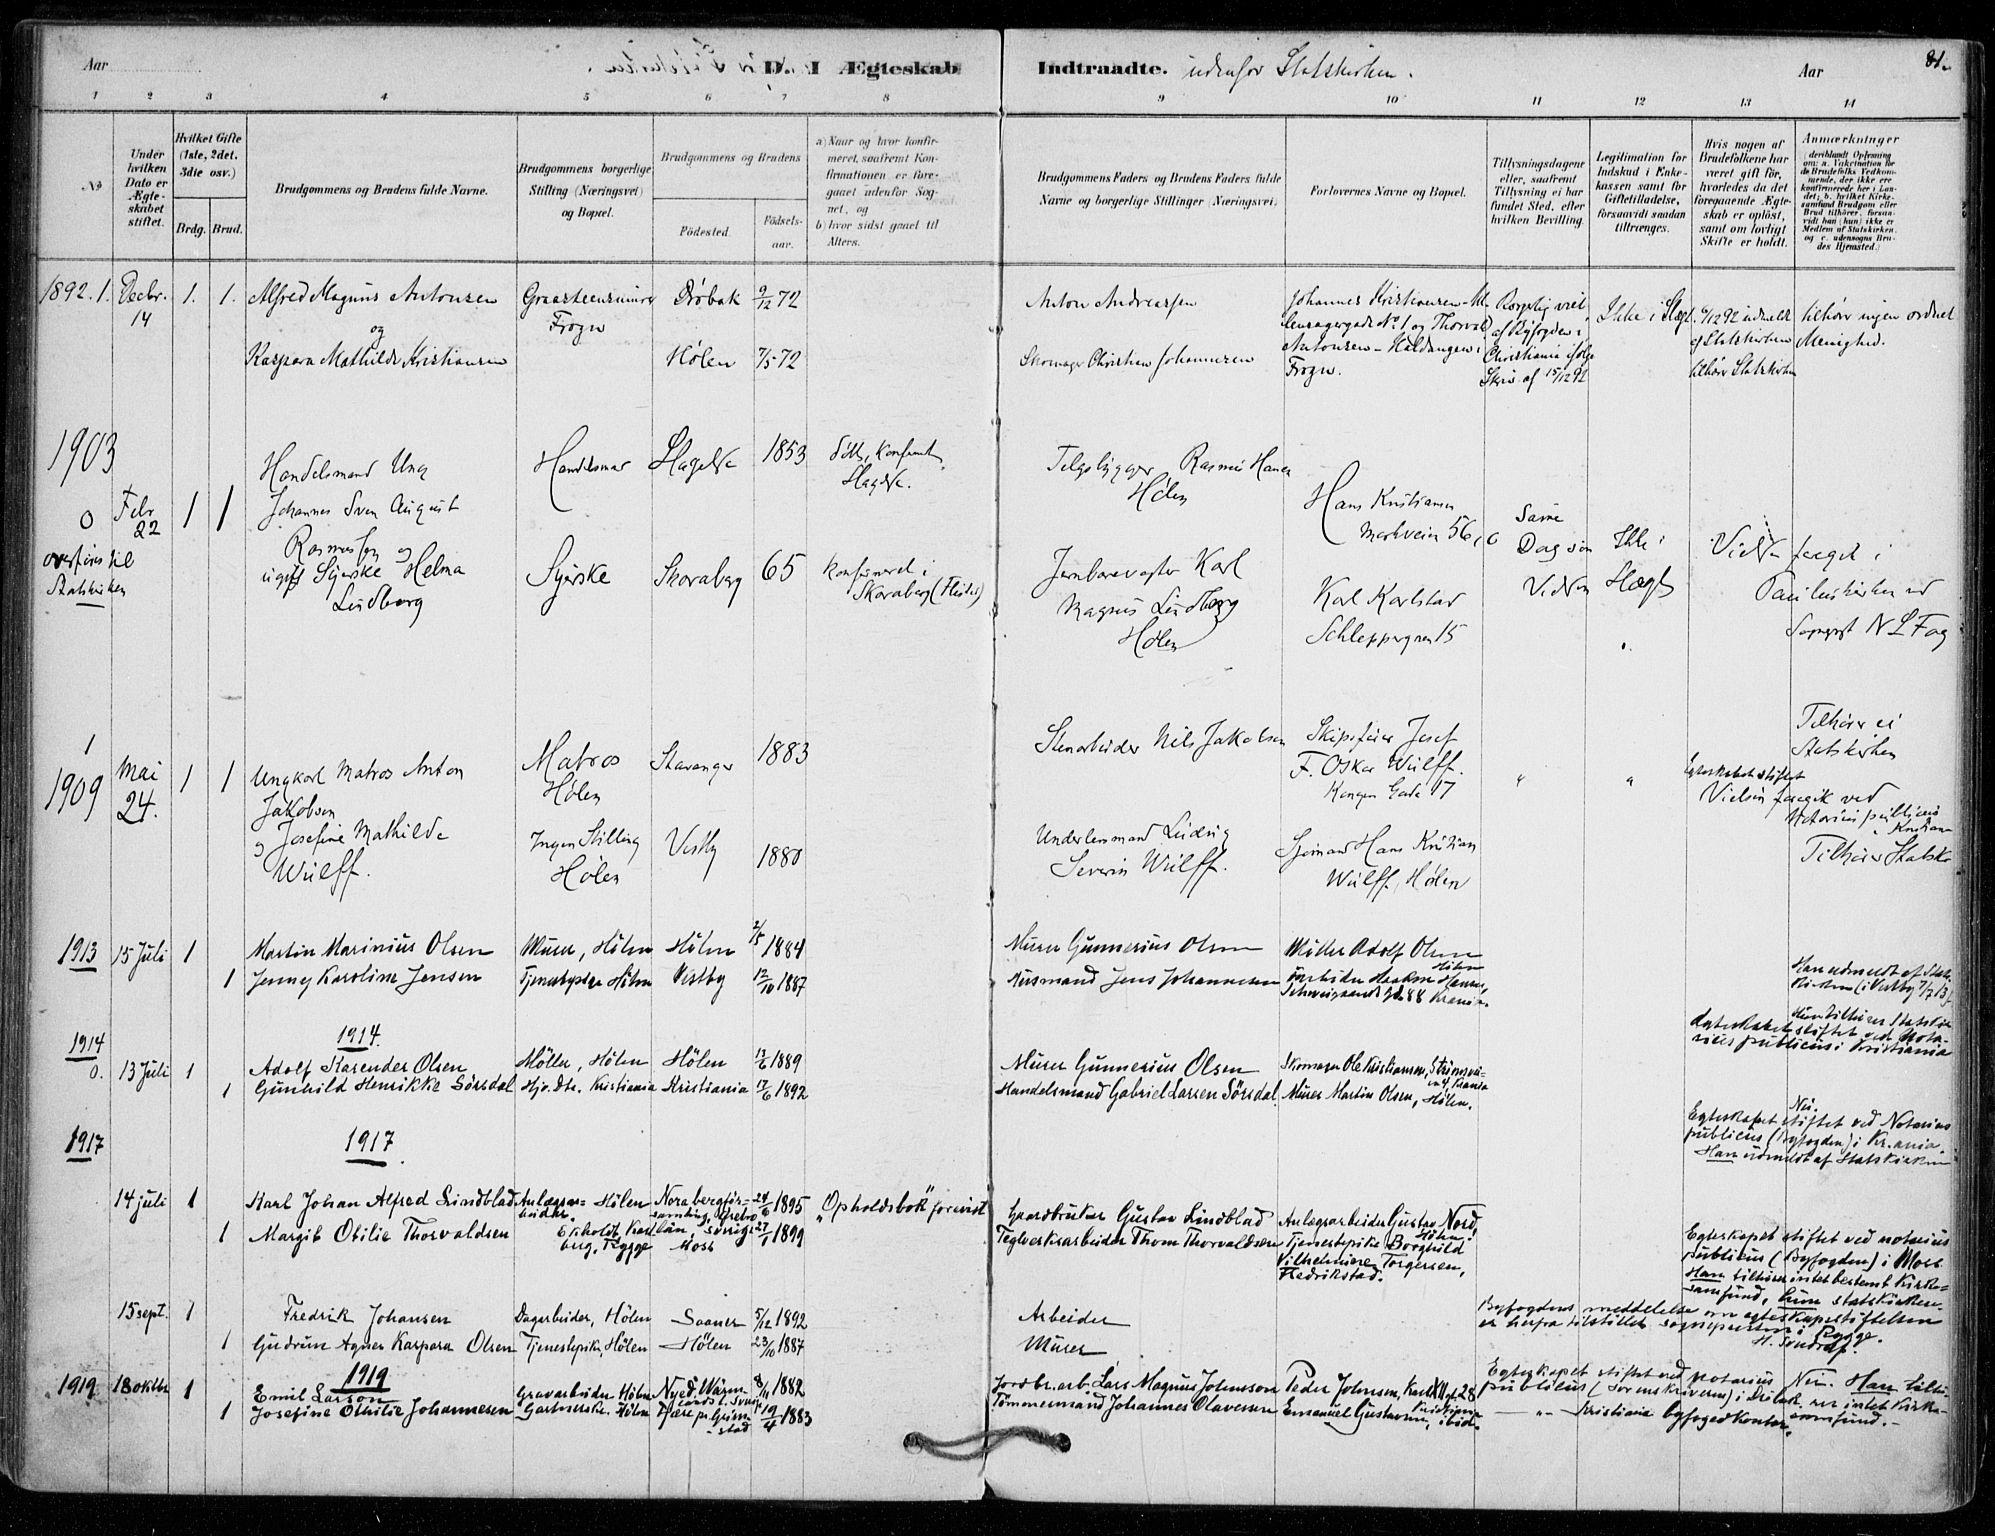 SAO, Vestby prestekontor Kirkebøker, F/Fe/L0001: Ministerialbok nr. V 1, 1878-1931, s. 81